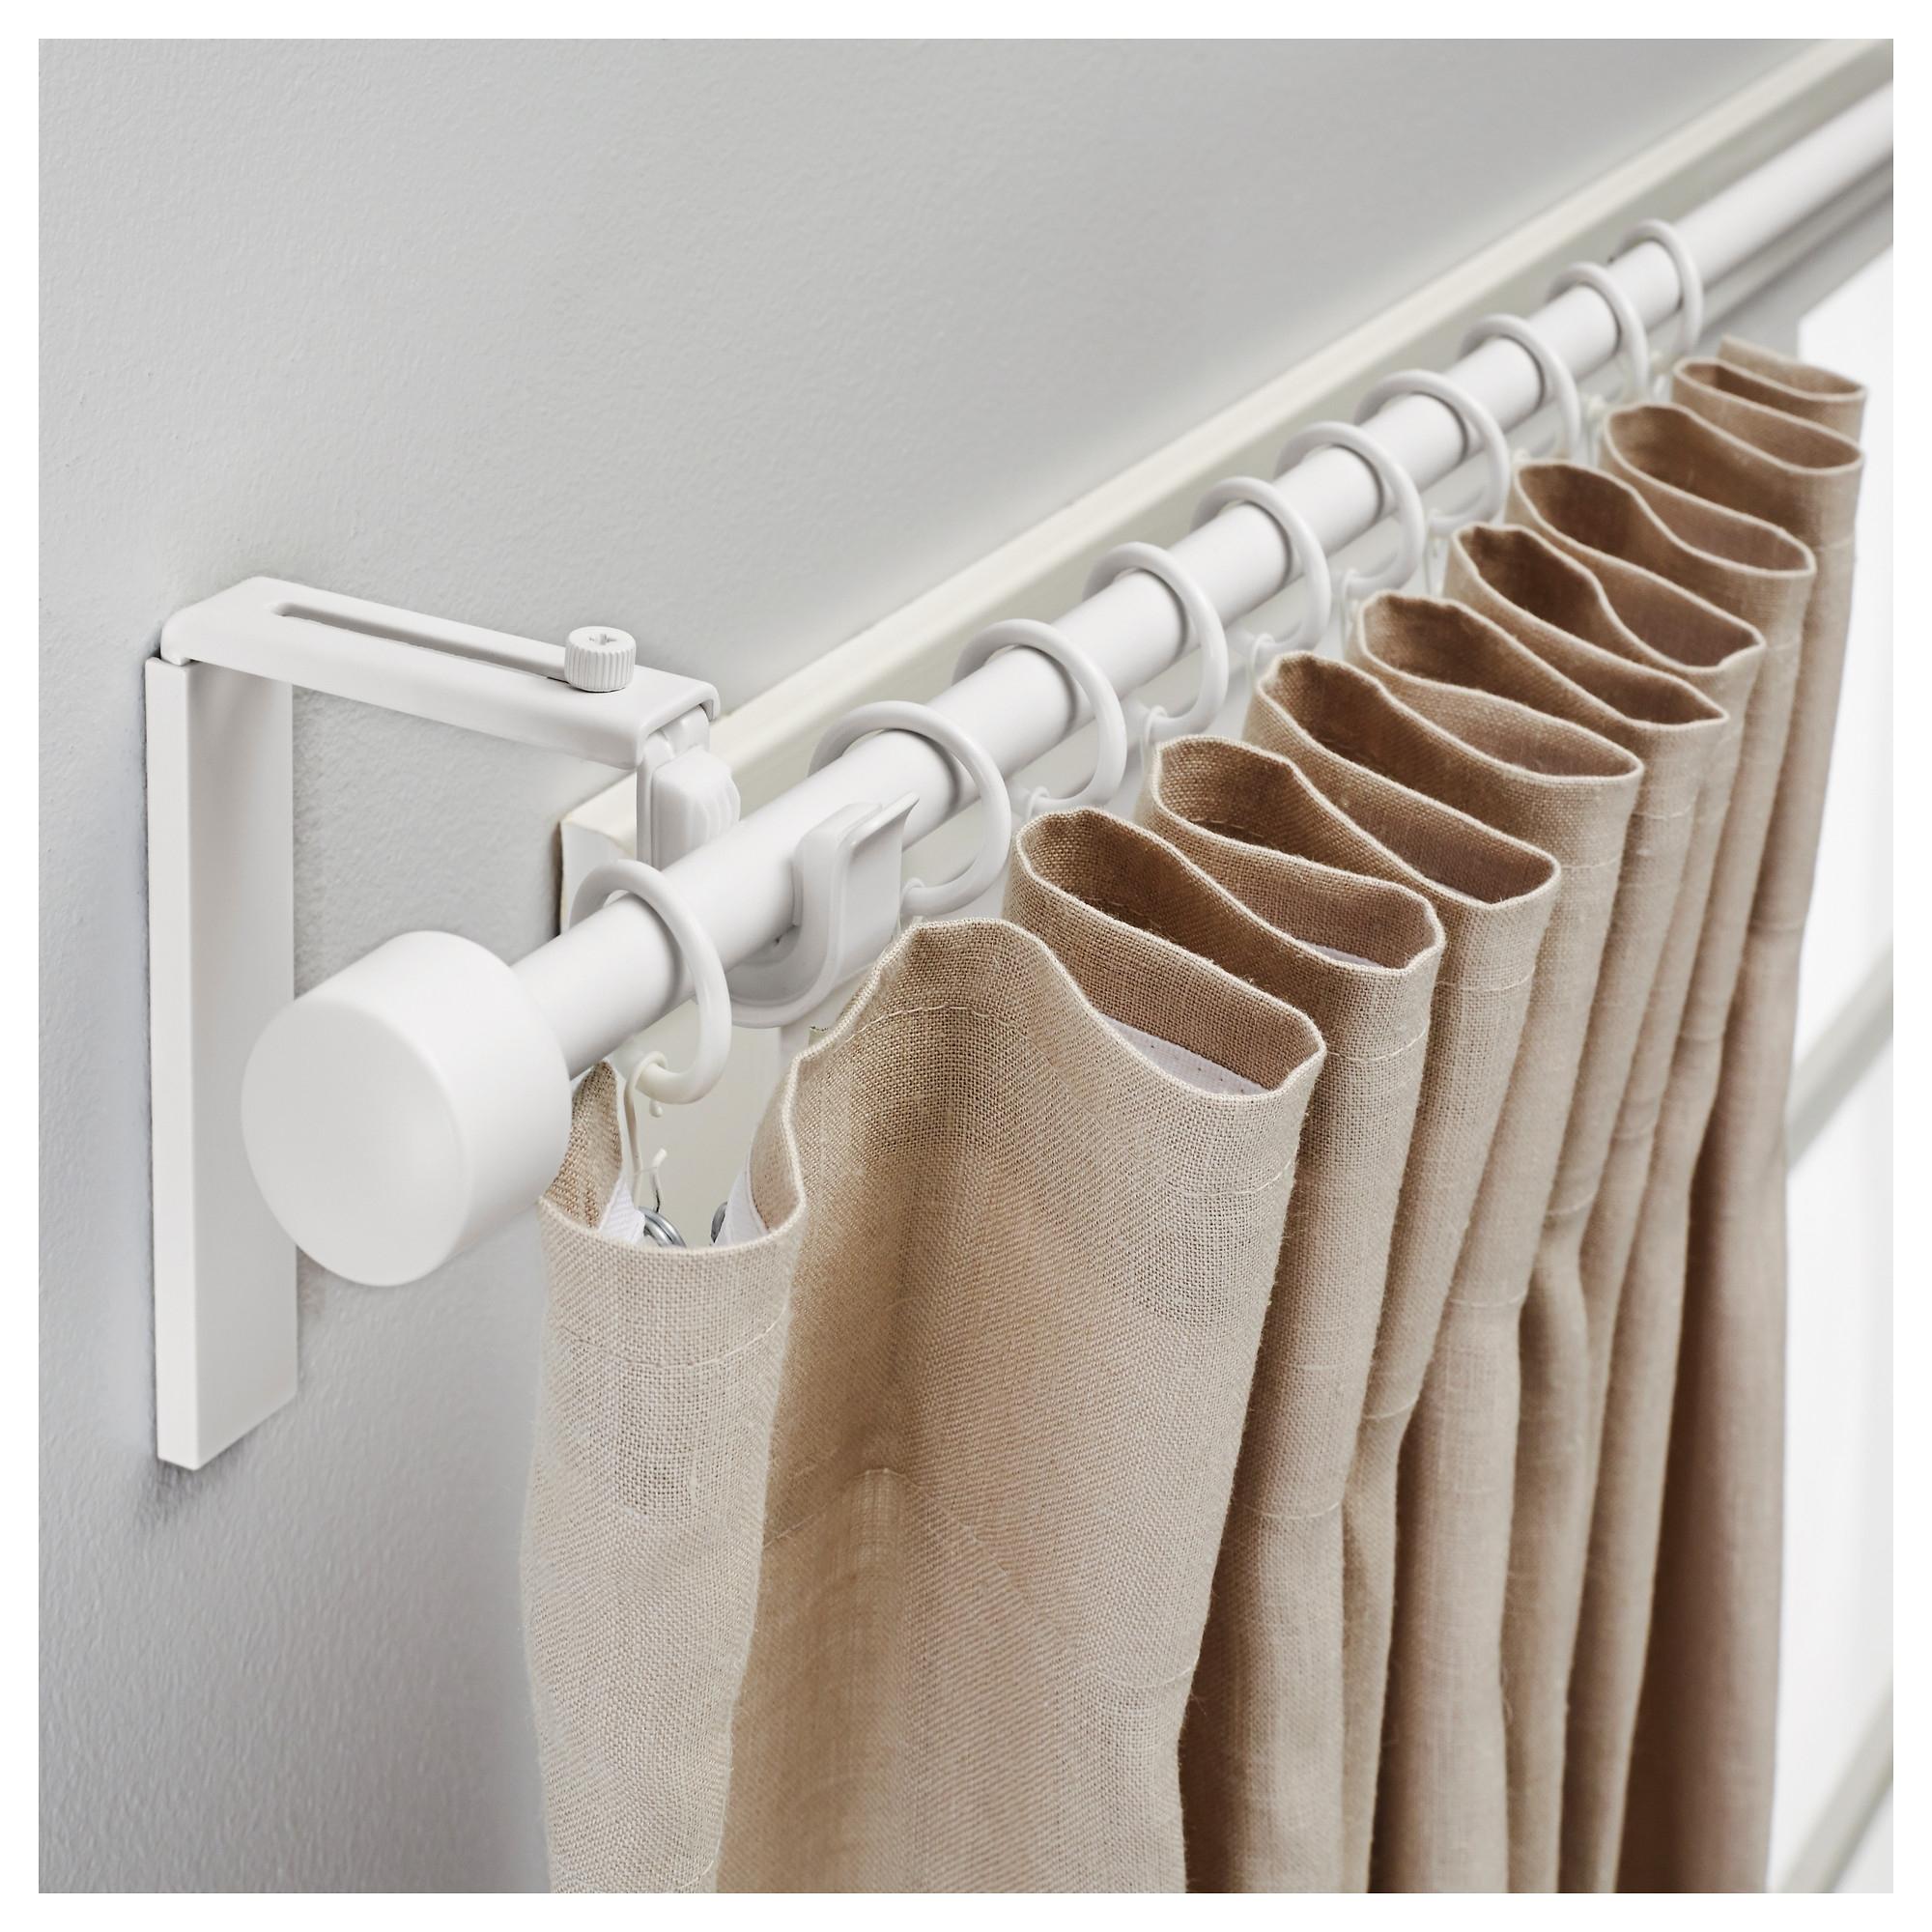 Ikea textiles alfombras textiles de ventana caroldoey - Alfombras ikea grandes ...